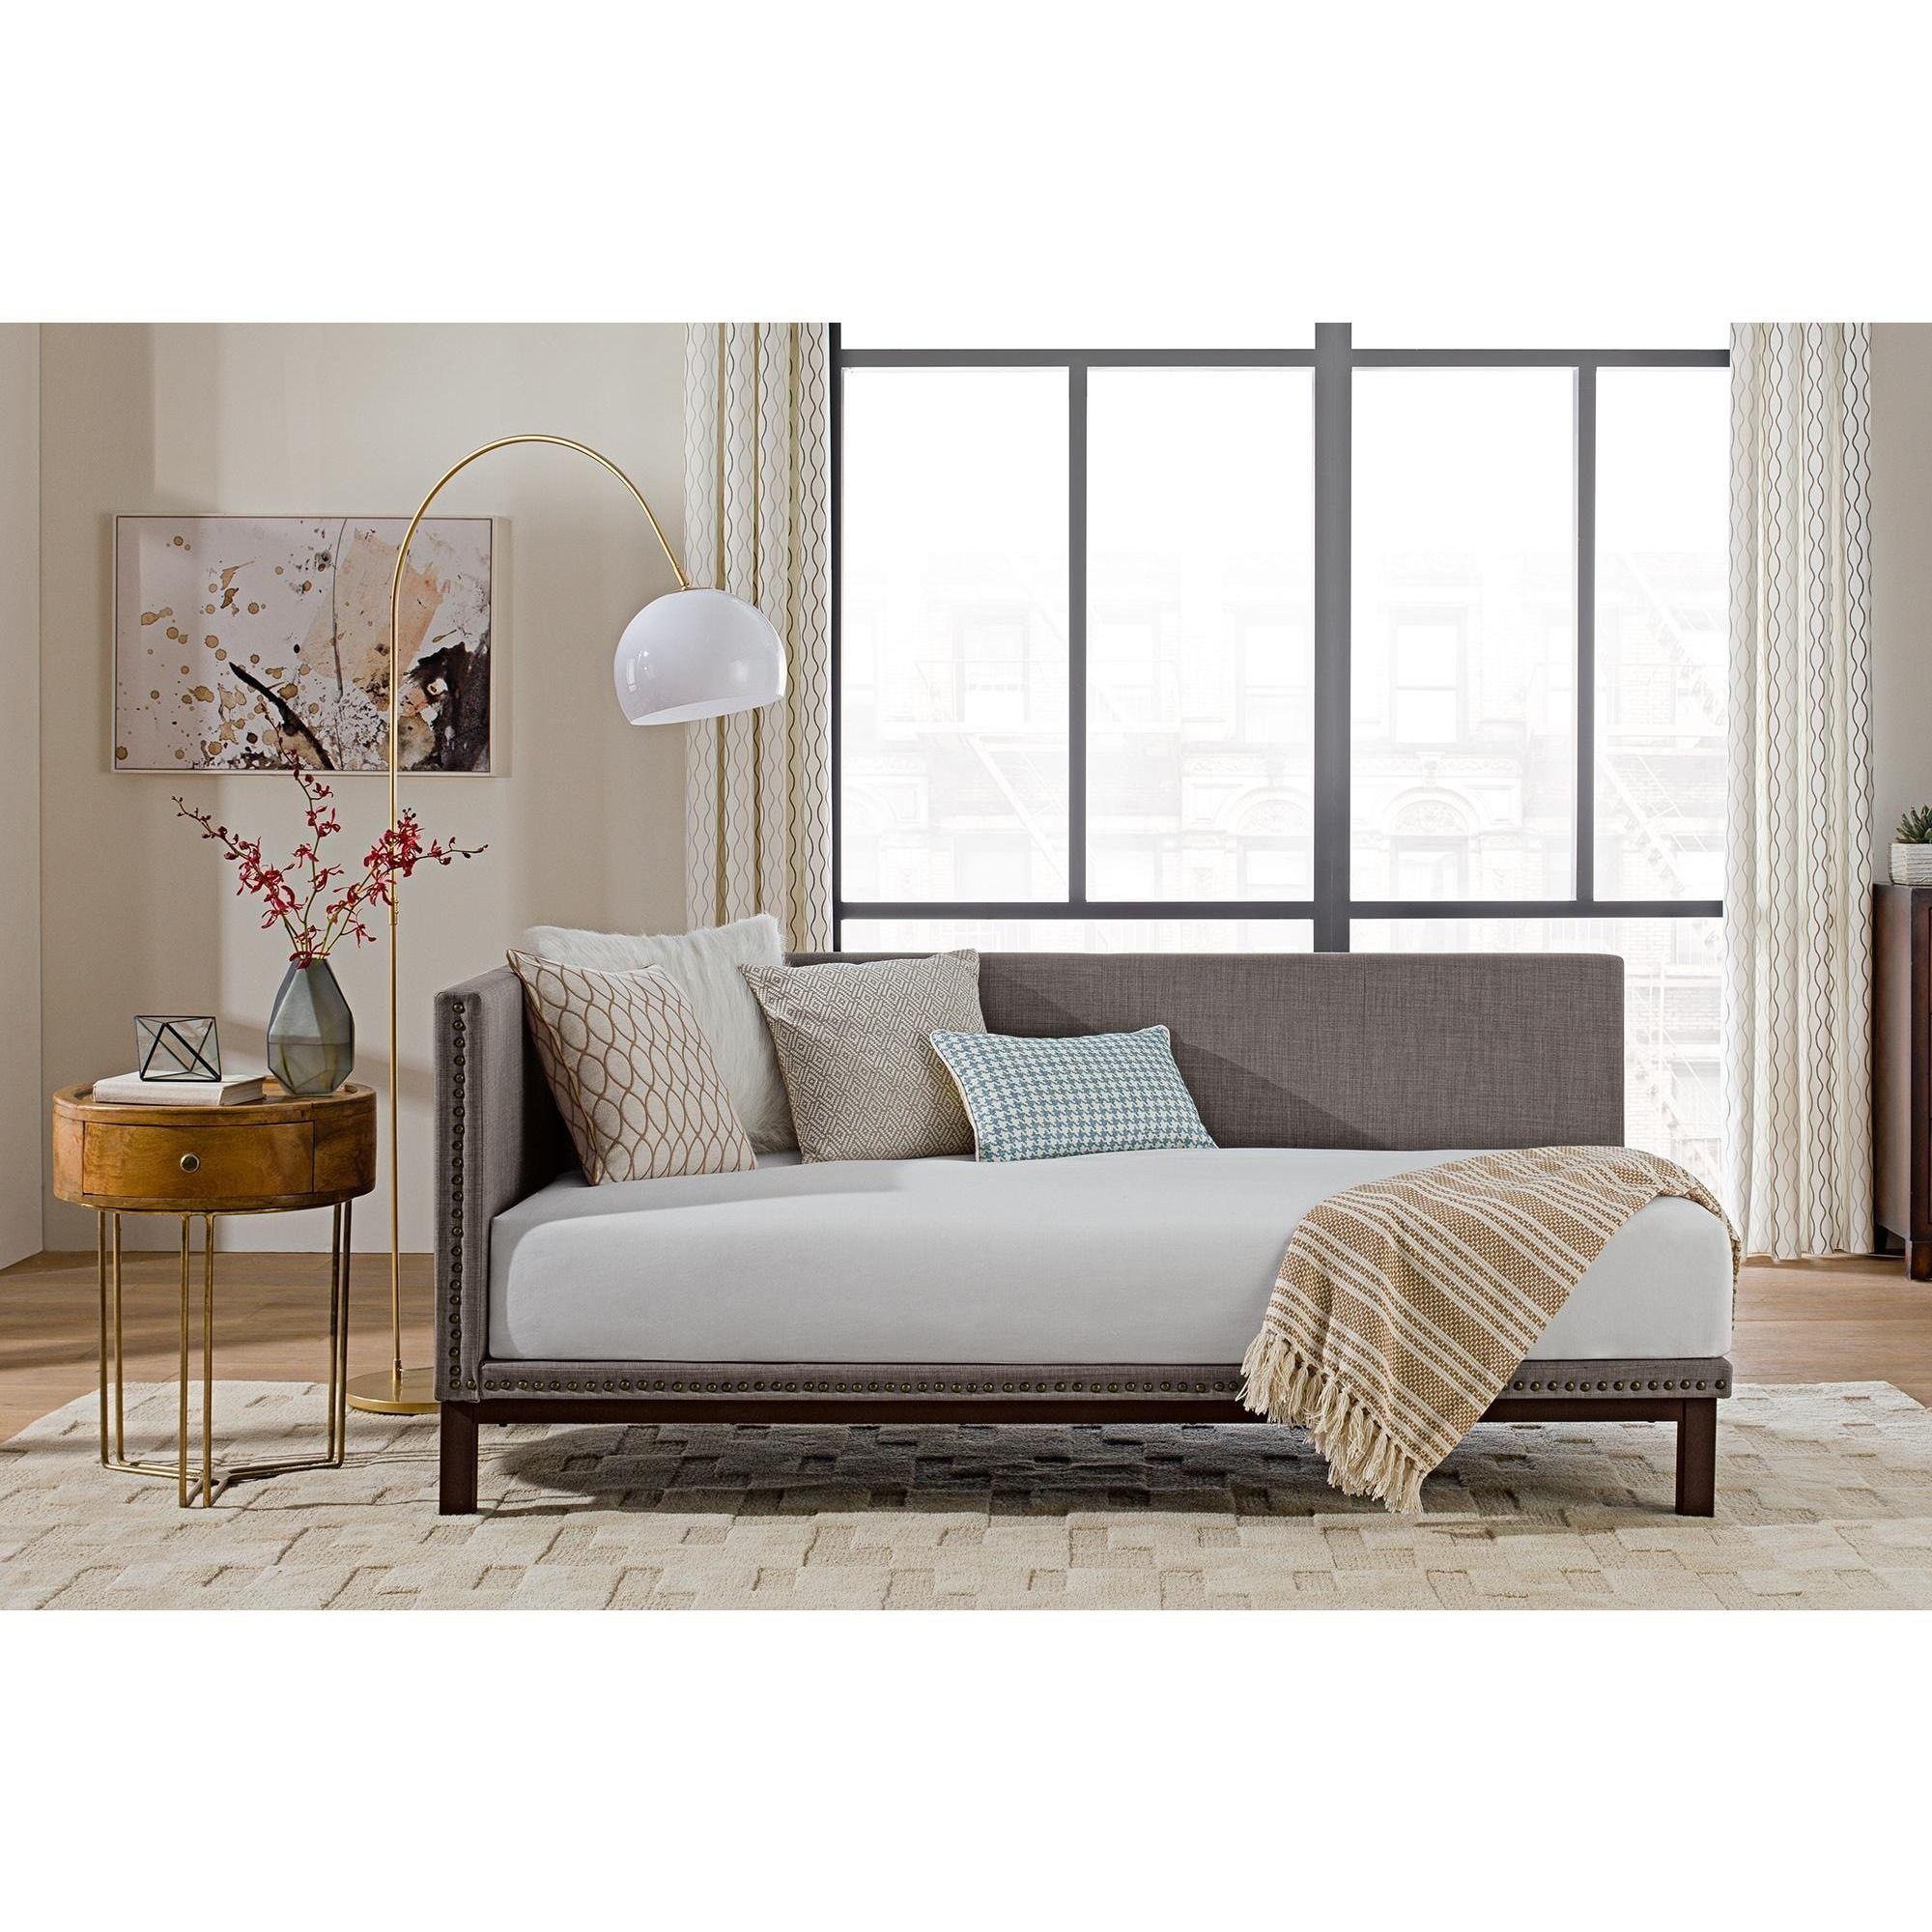 Avenue Greene Dhp Mid-century Grey Upholstered Modern